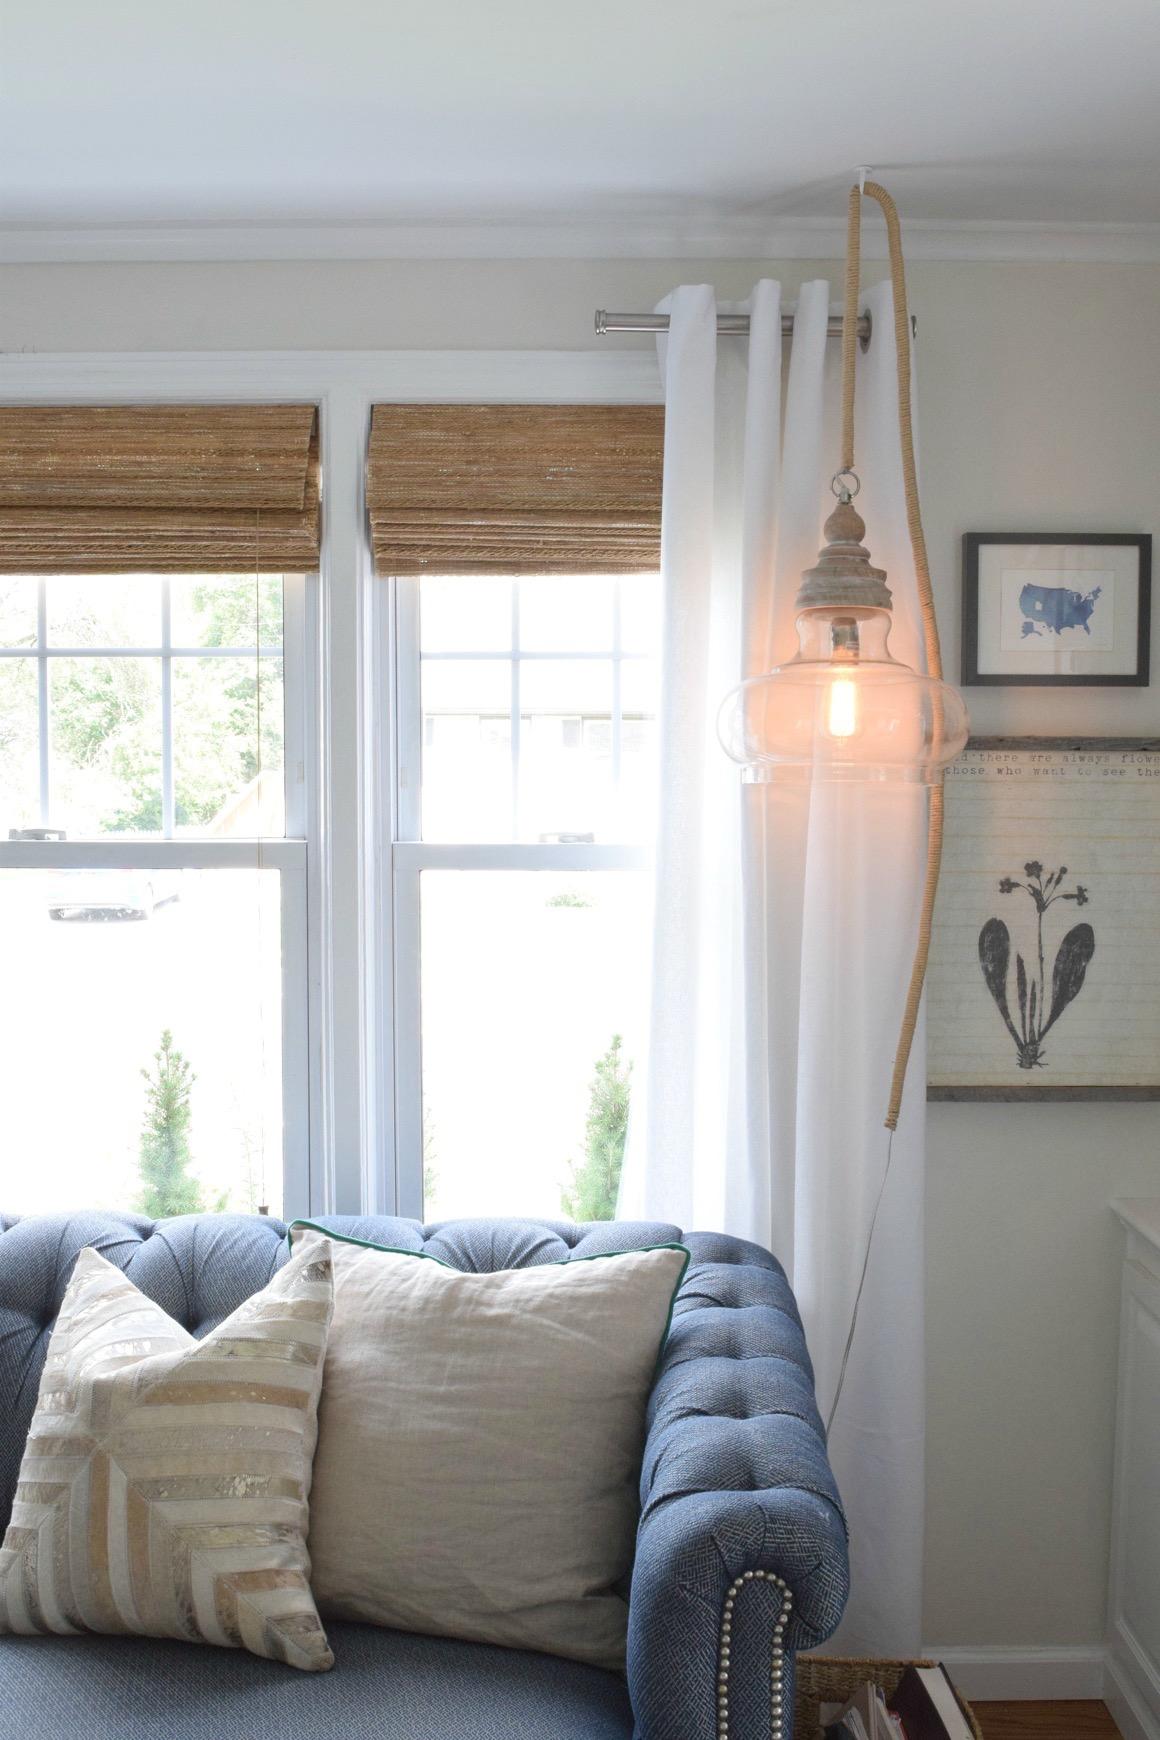 Hanging Pendant Light Diy Nesting With Gracerhnestingwithgrace: Hanging Lights For Bedroom Plug In At Home Improvement Advice